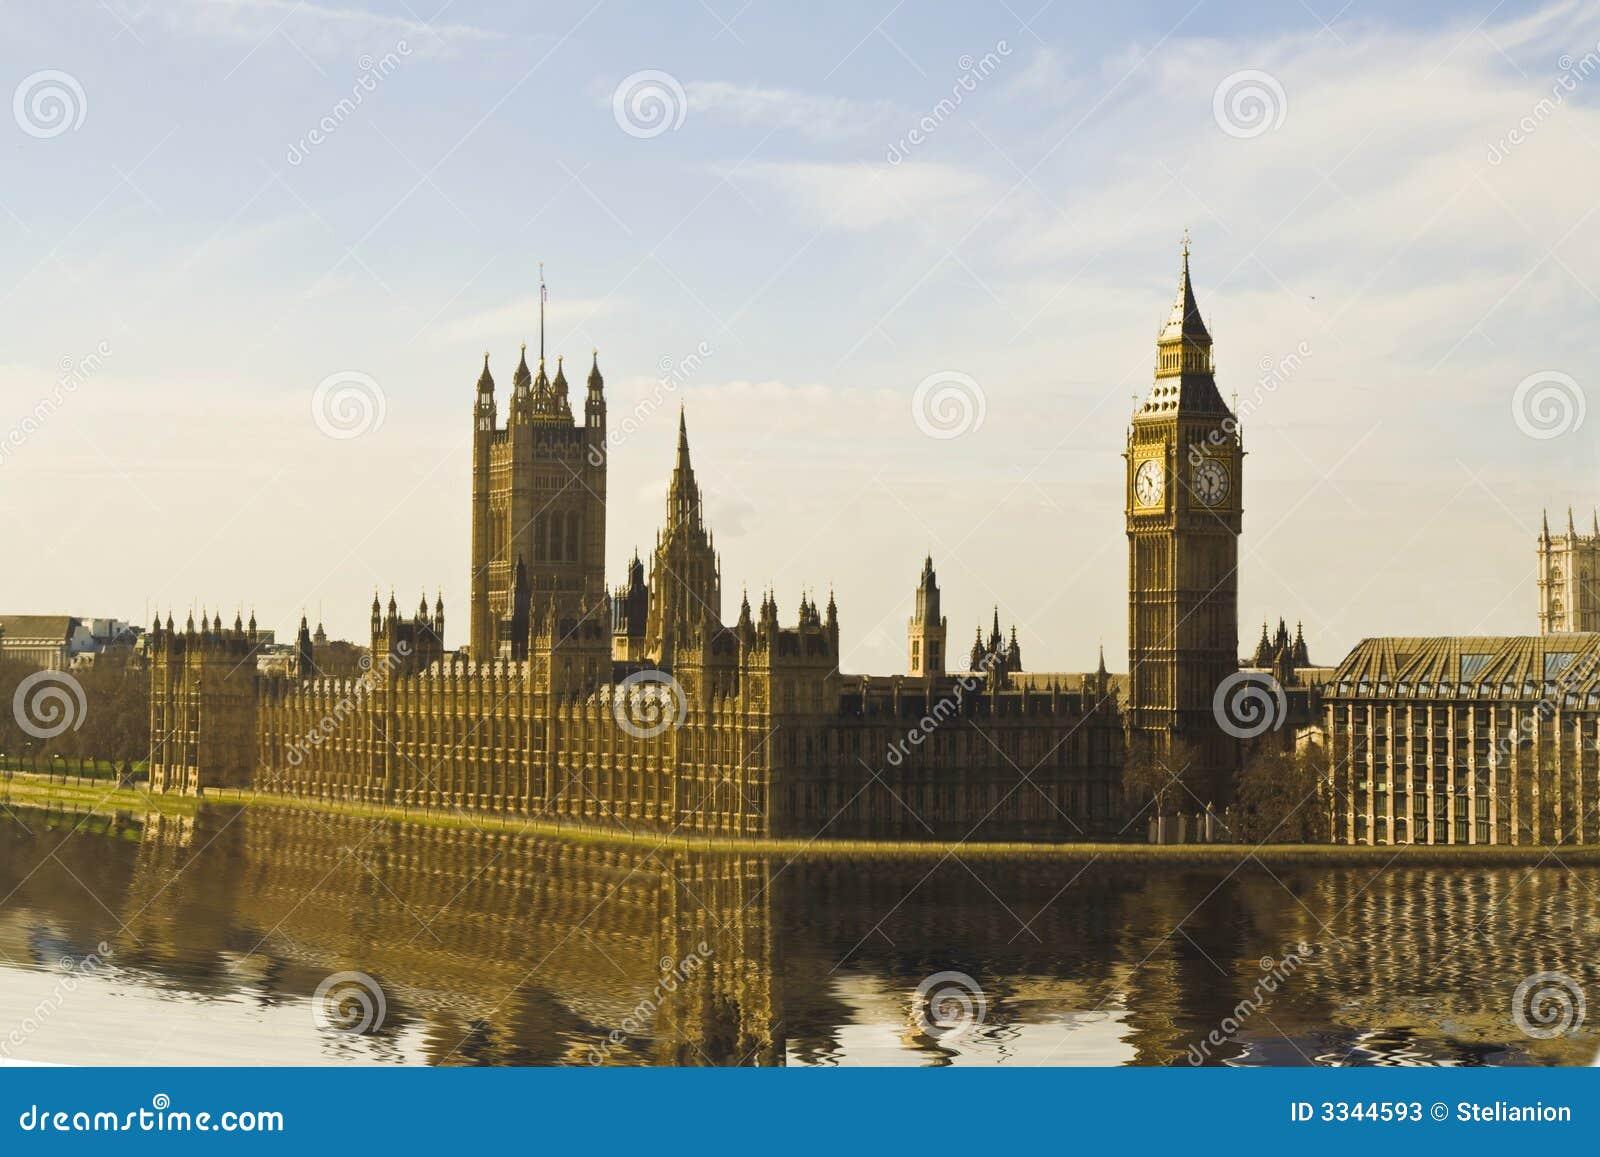 Camera del Parlamento & di grande Ben